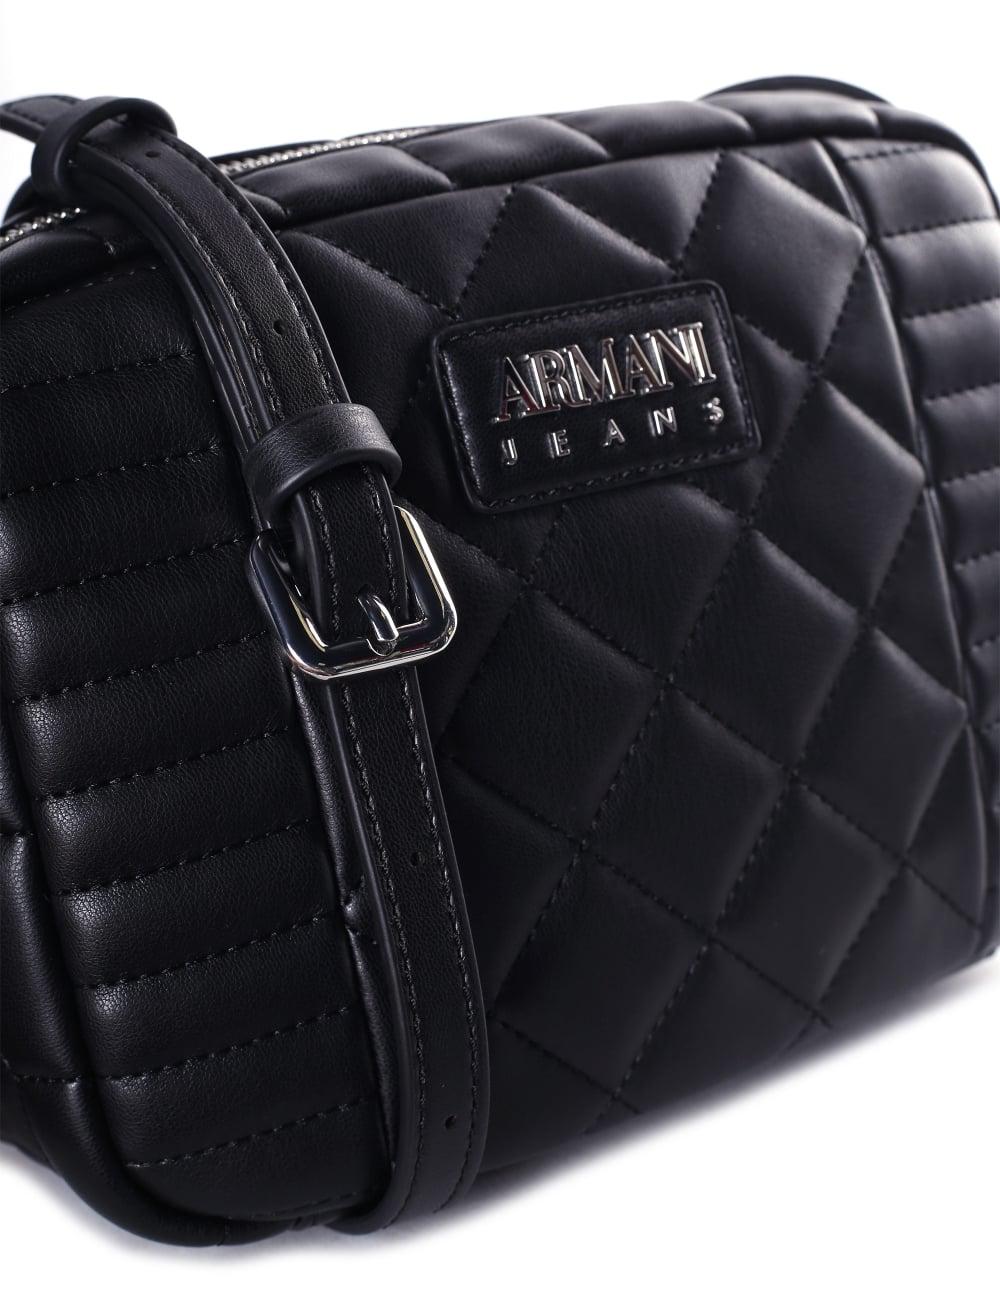 Armani Jeans Women S Crossbody Sling Bag